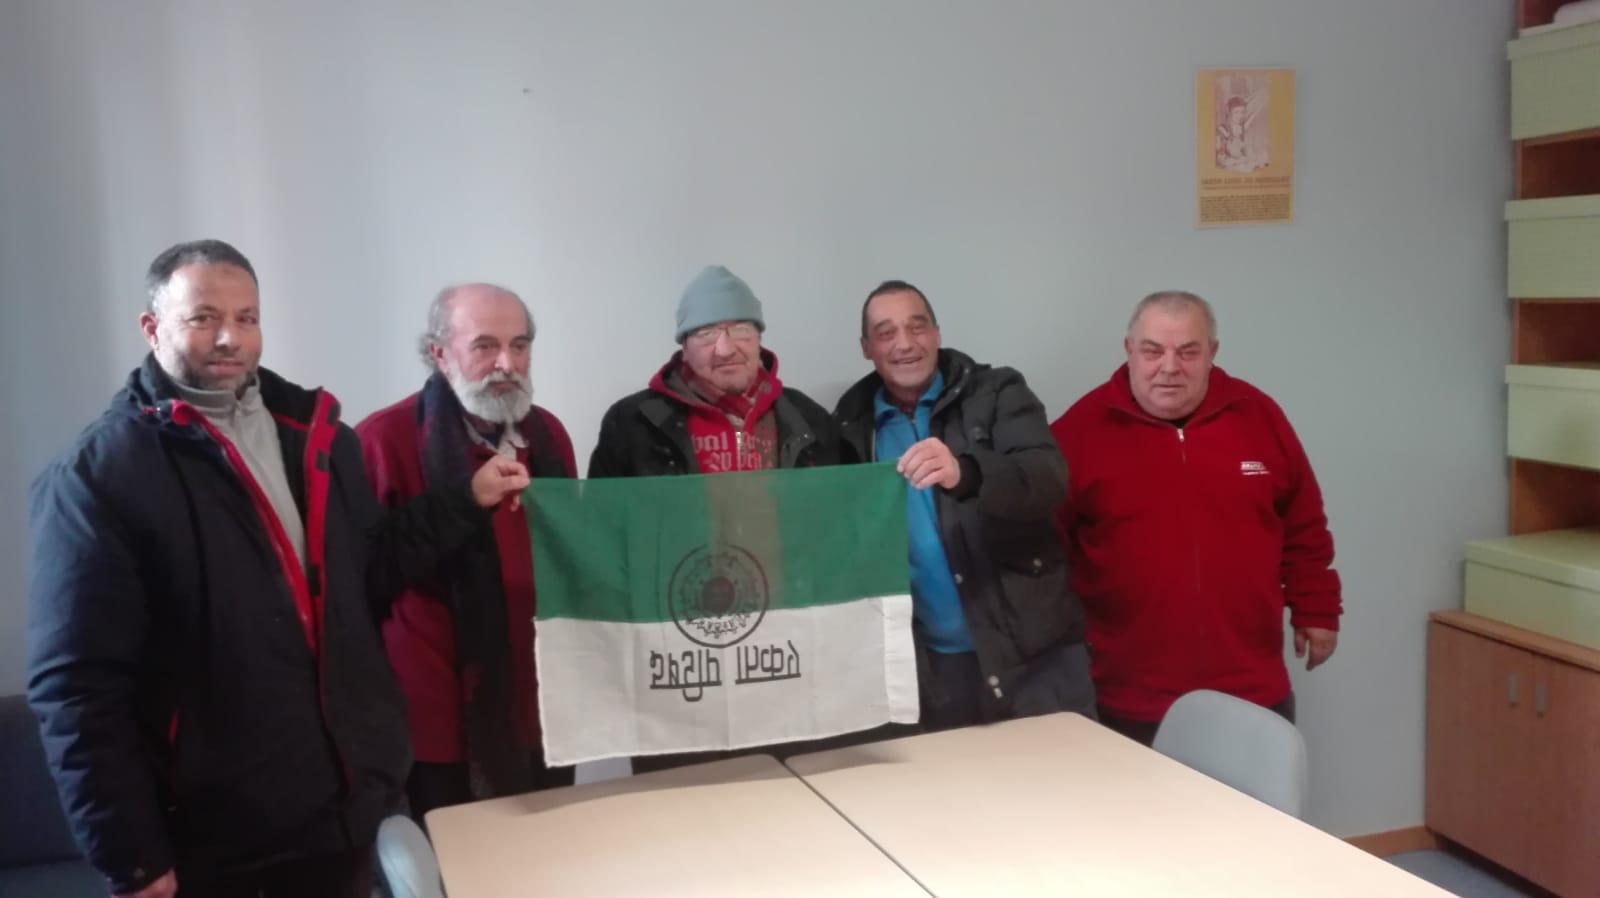 Nuevo grupo JaiJagat de Personas Sin Hogar